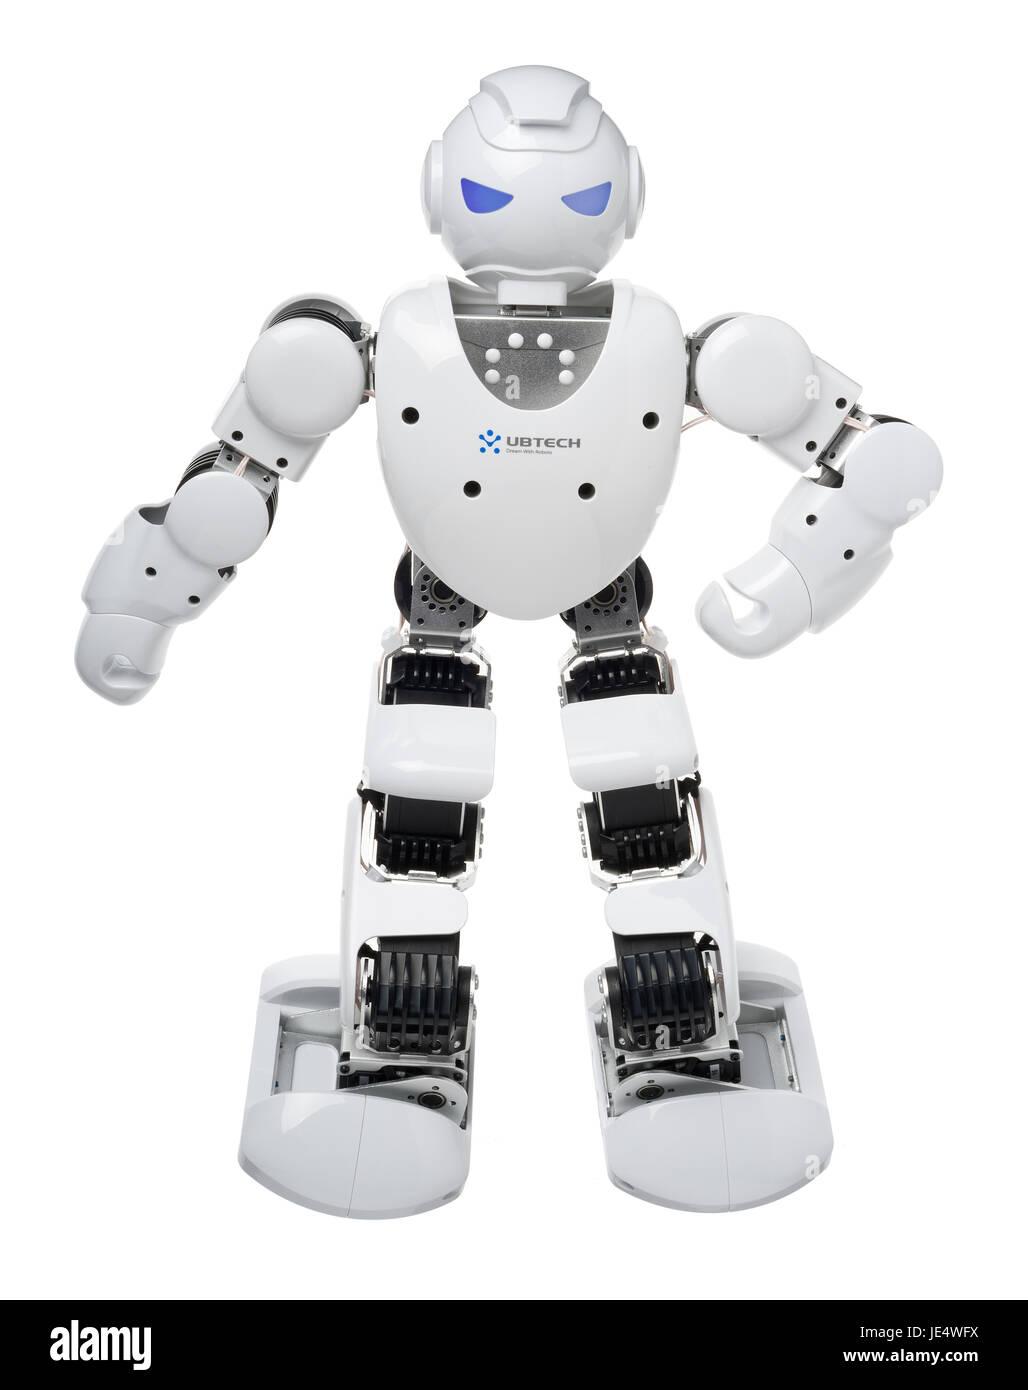 UBTECH Alpha 1S robot - Stock Image